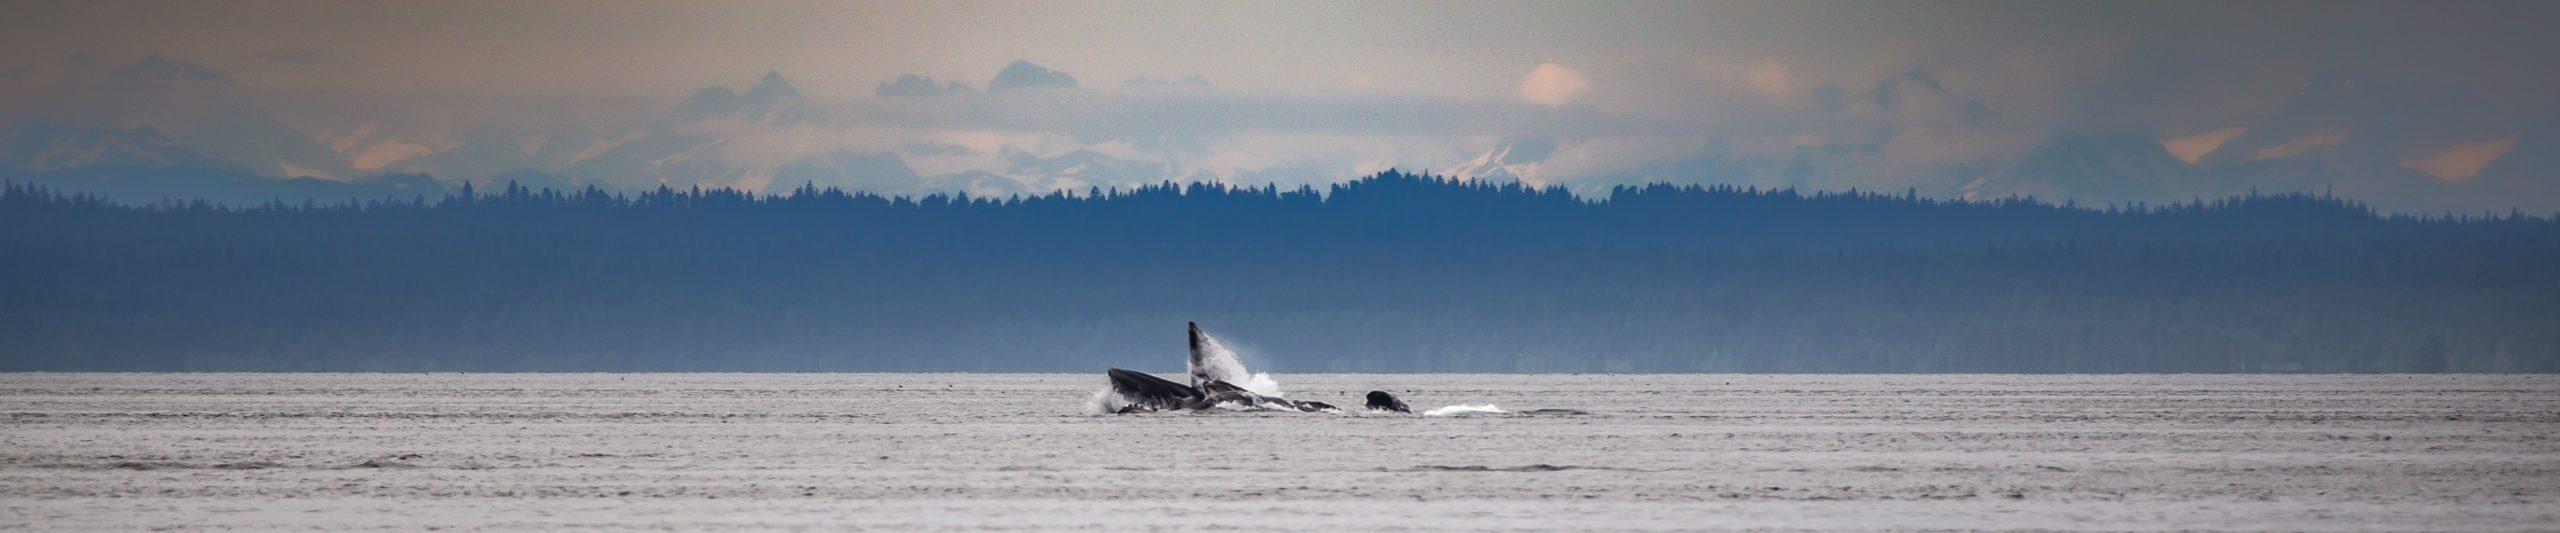 whale in prince william sound